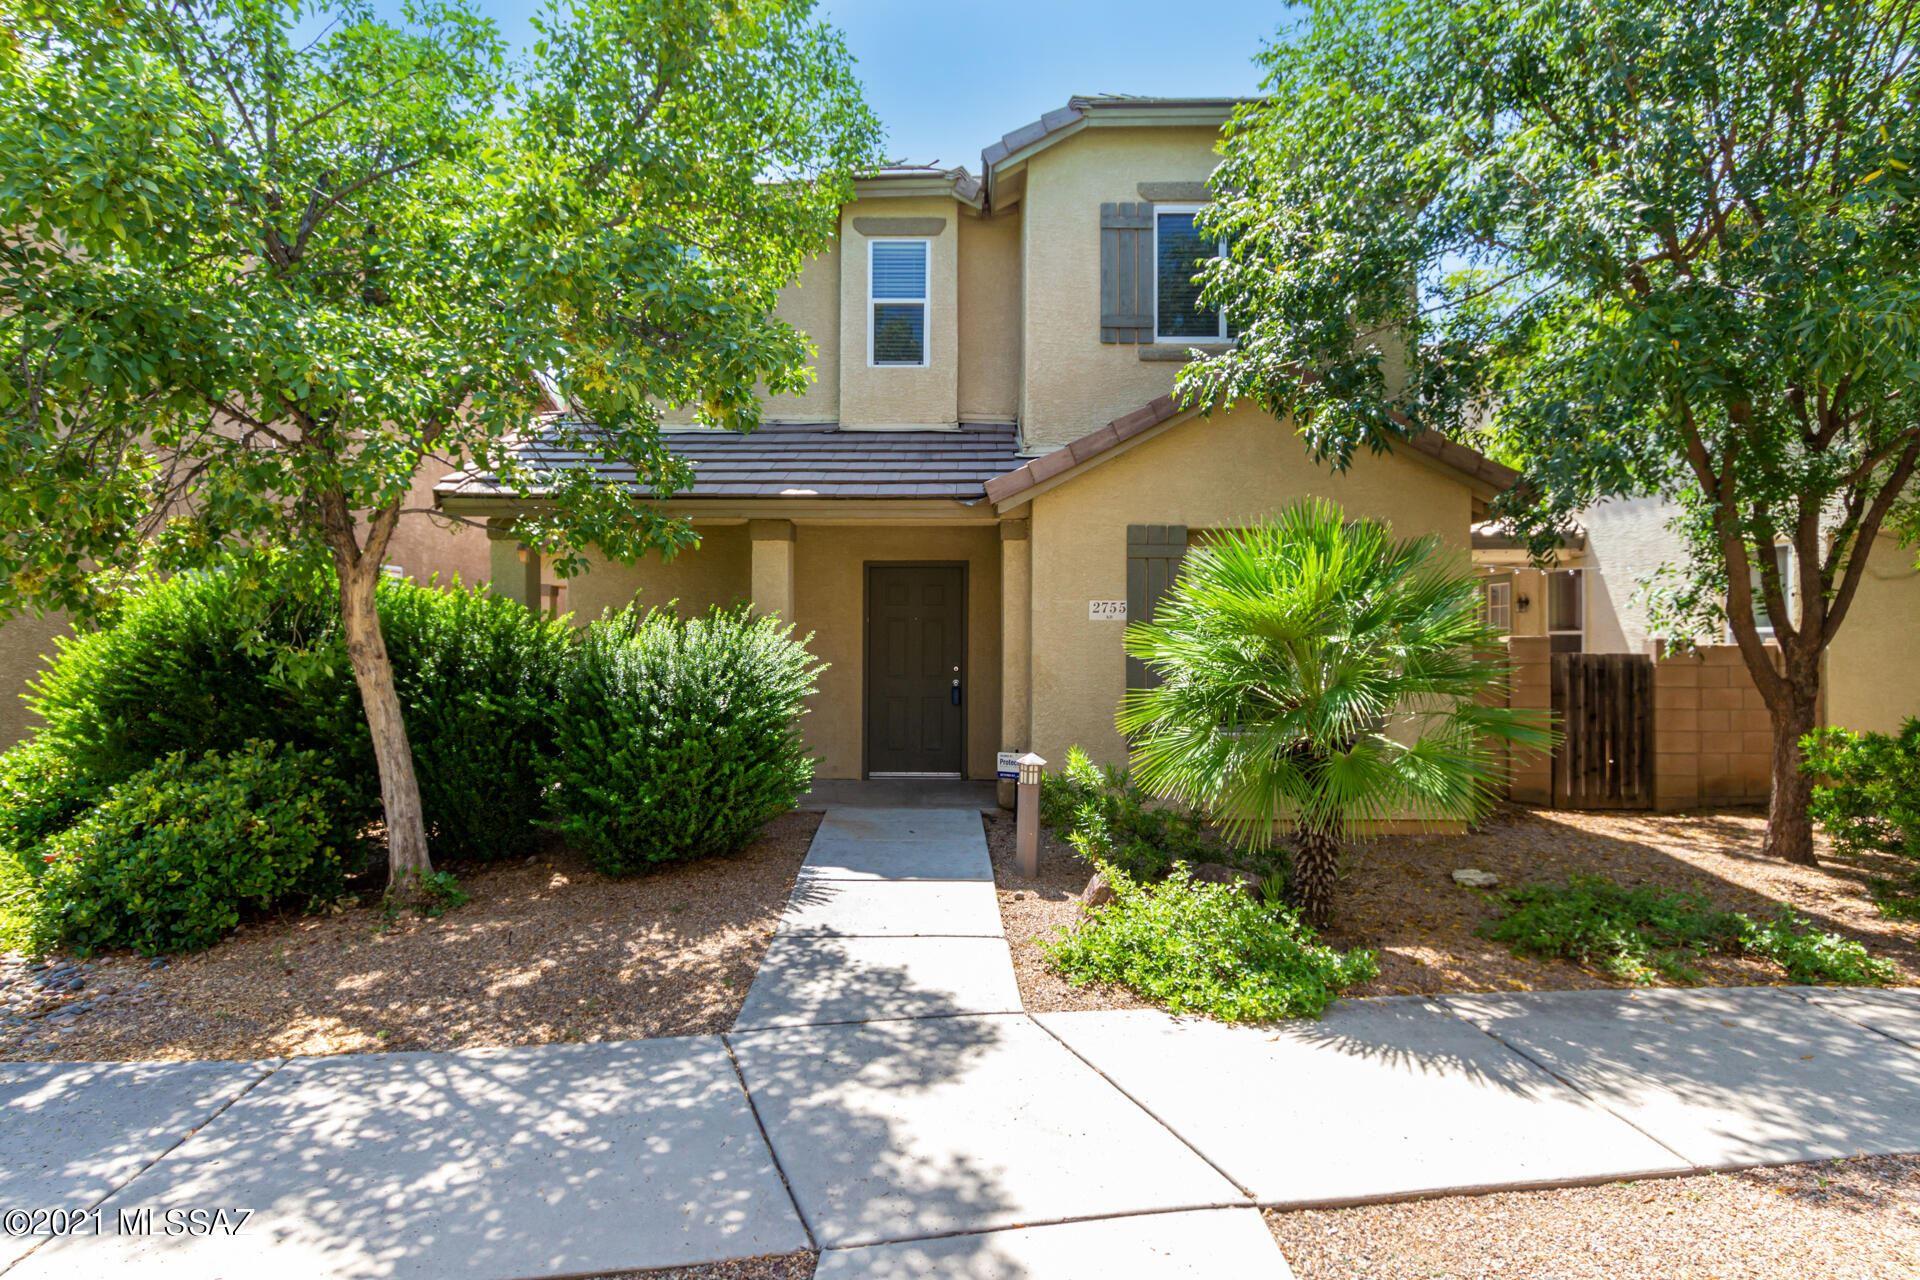 2755 N Saramano Lane, Tucson, AZ 85712 - MLS#: 22123457